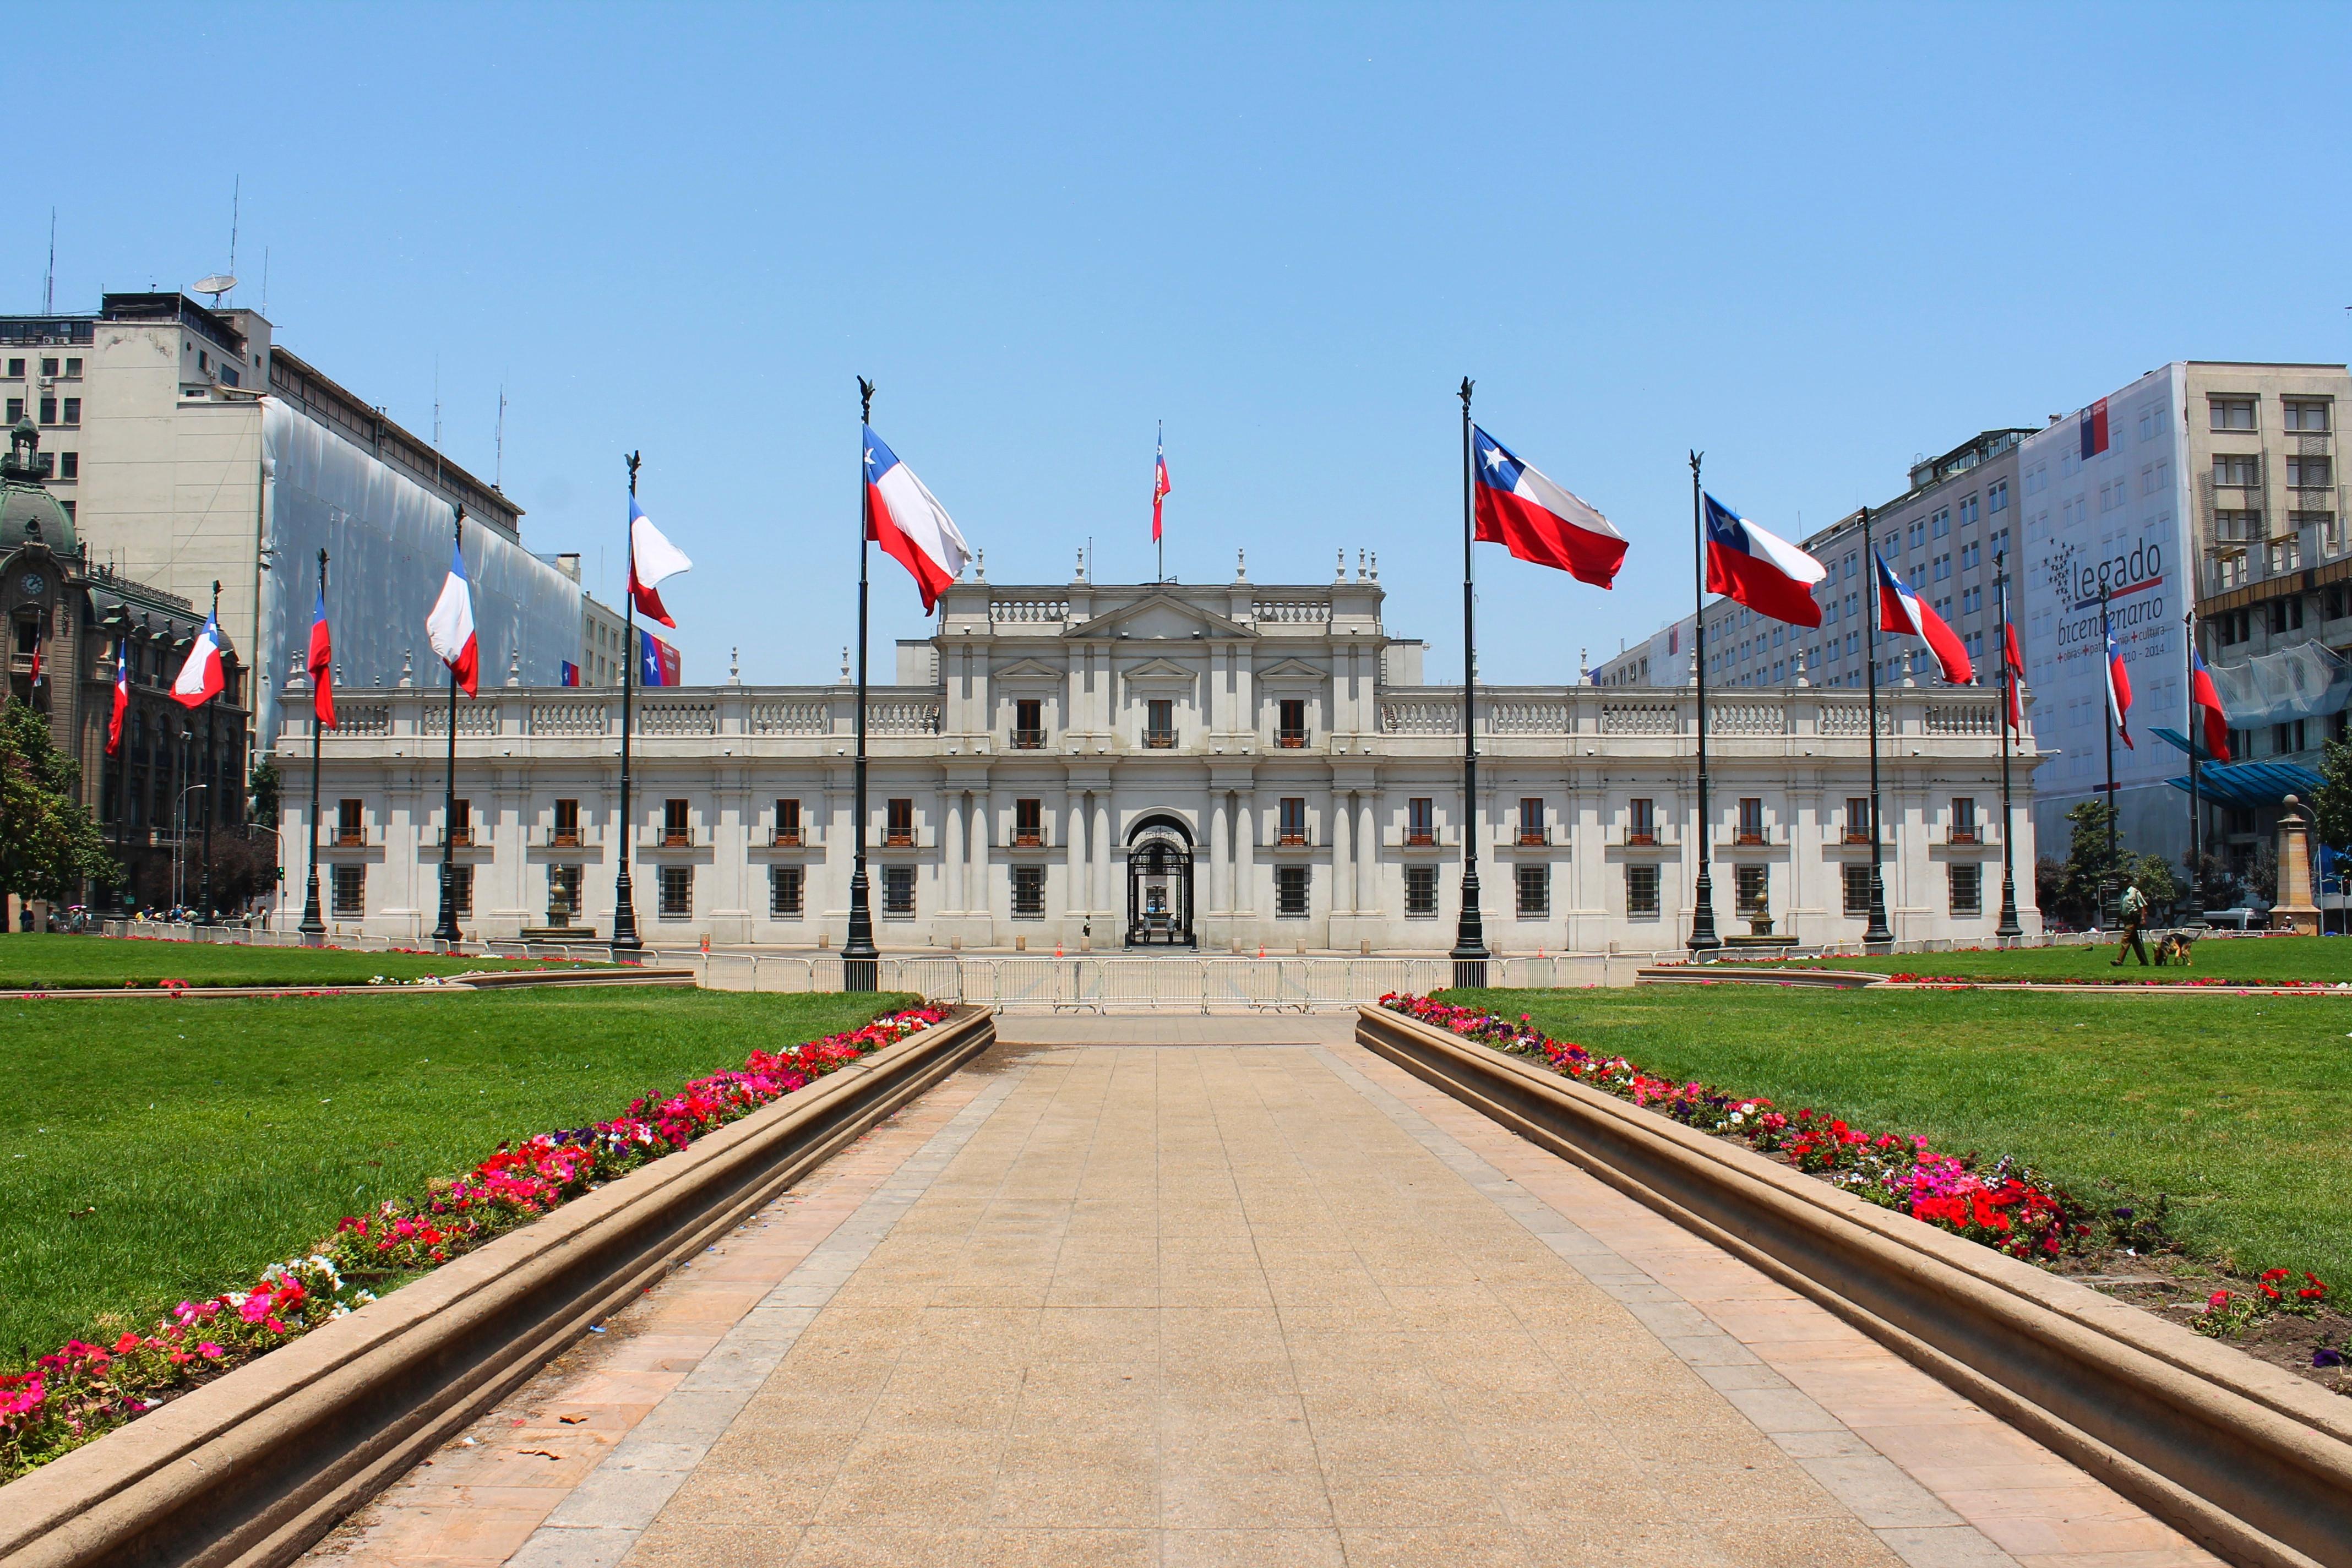 File:Palacio de La Moneda - miguelreflex.jpg - Wikimedia Commons